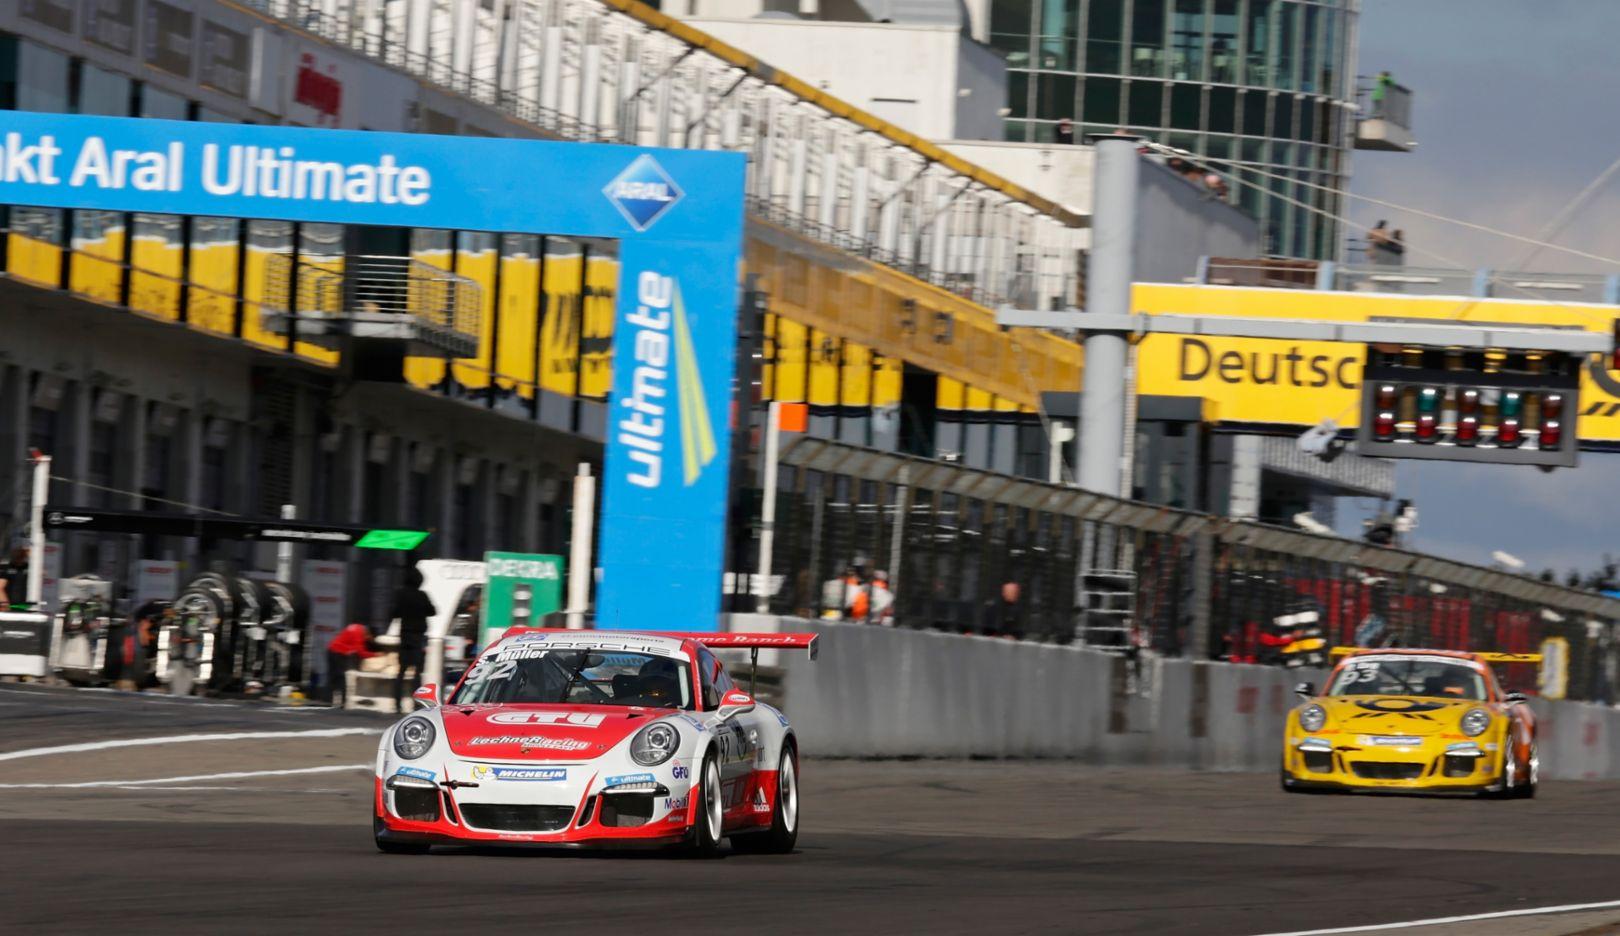 Porsche 911 GT3 Cup, Porsche Carrera Cup Deutschland, Nürburgring, 2015, Porsche AG